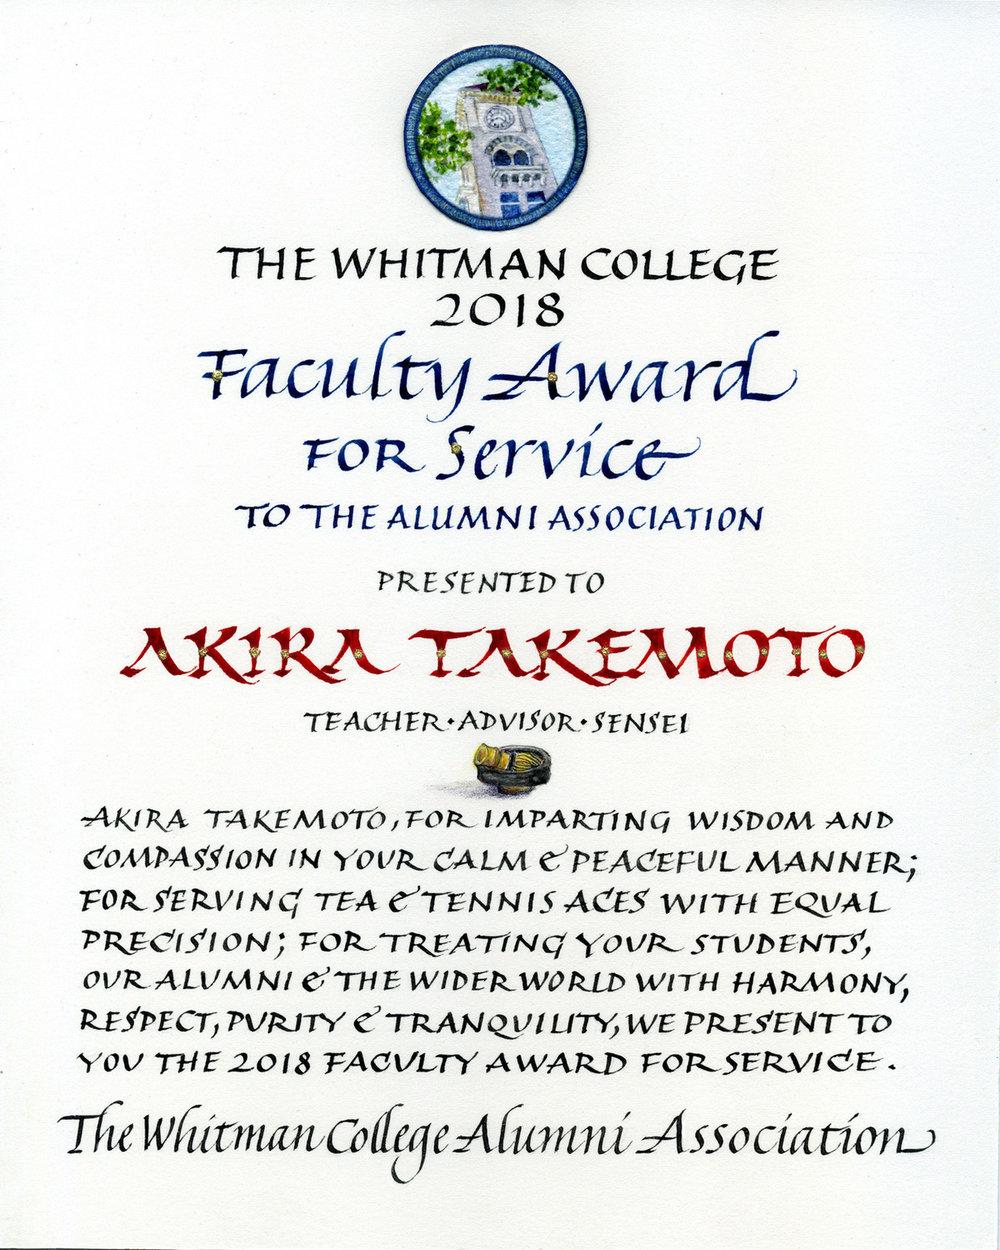 Faculty Award